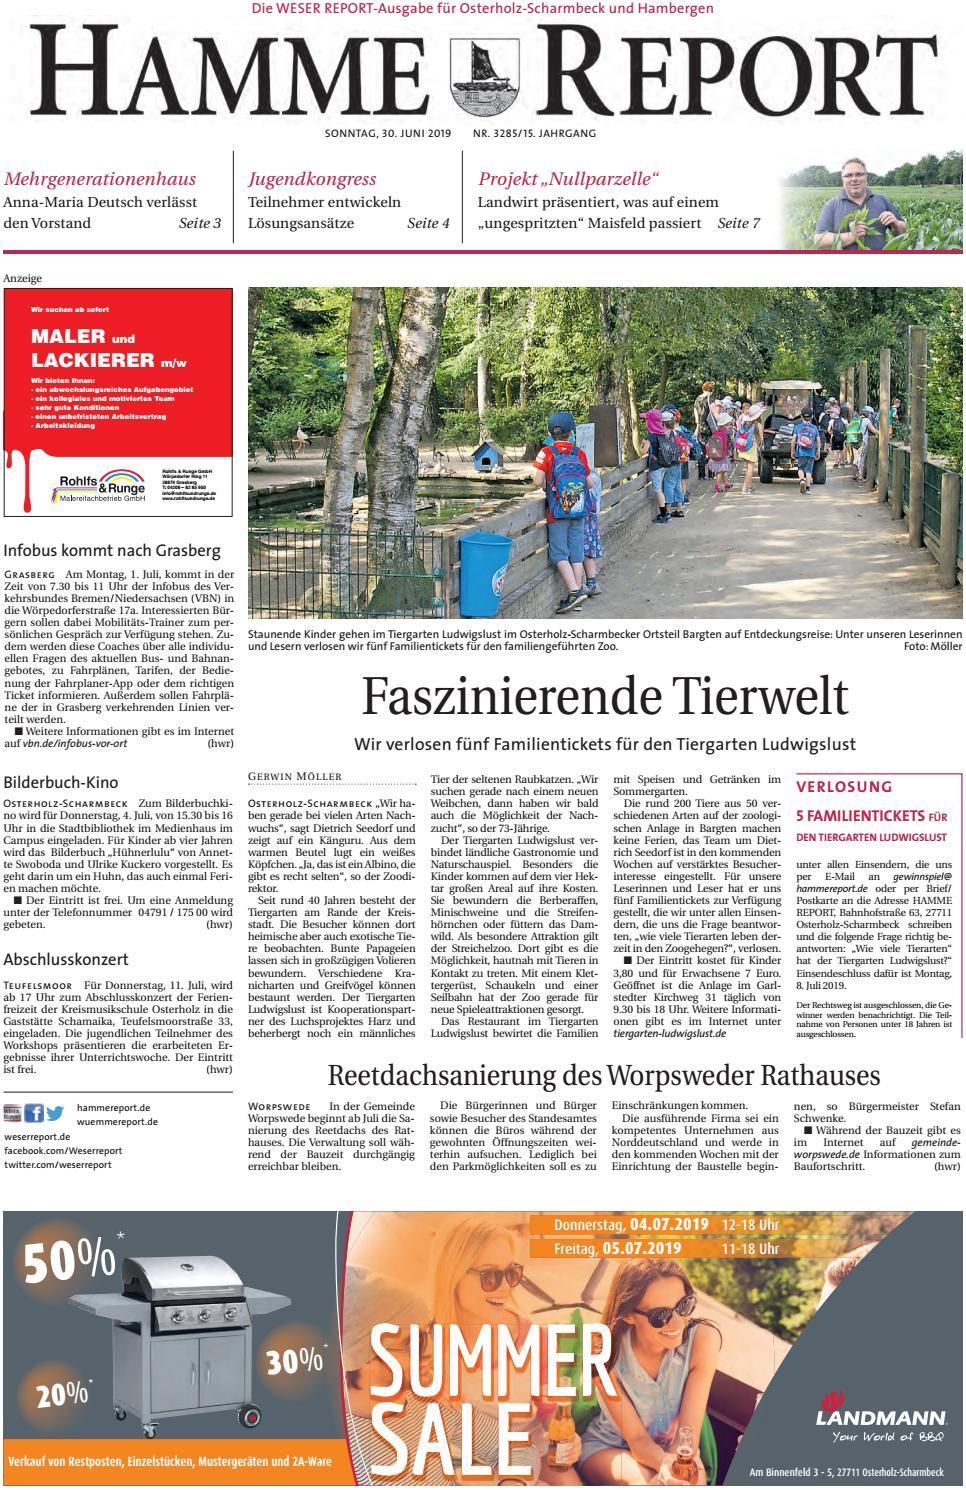 Hamme Report vom 30.06.2019 by KPS Verlagsgesellschaft mbH